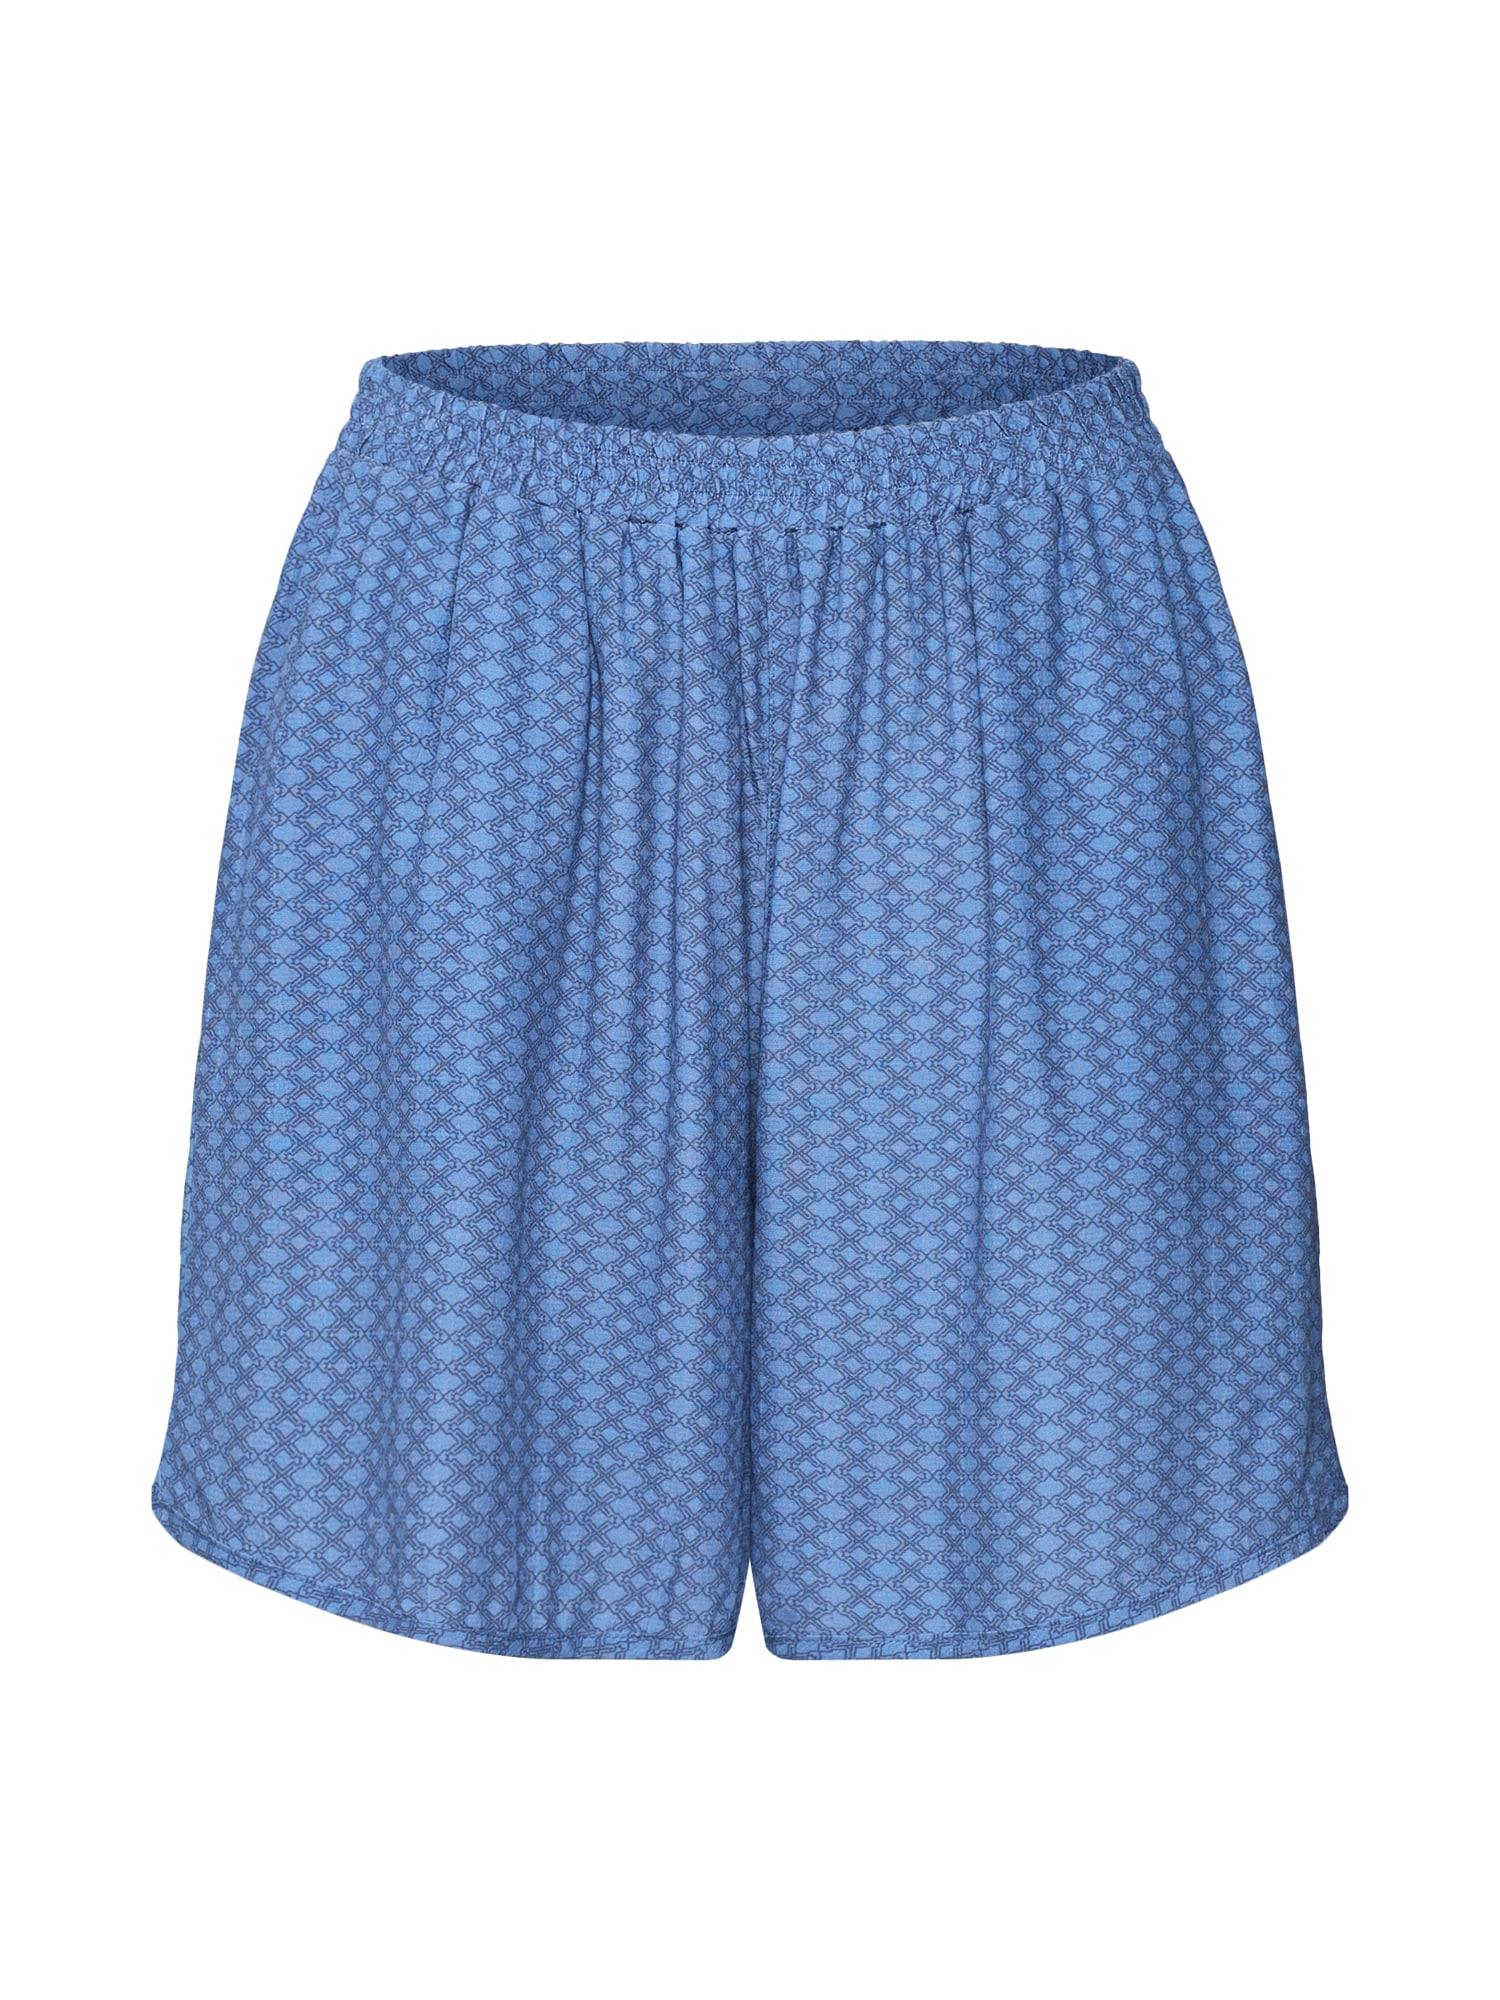 basic apparel Kelnės 'Elly' mėlyna